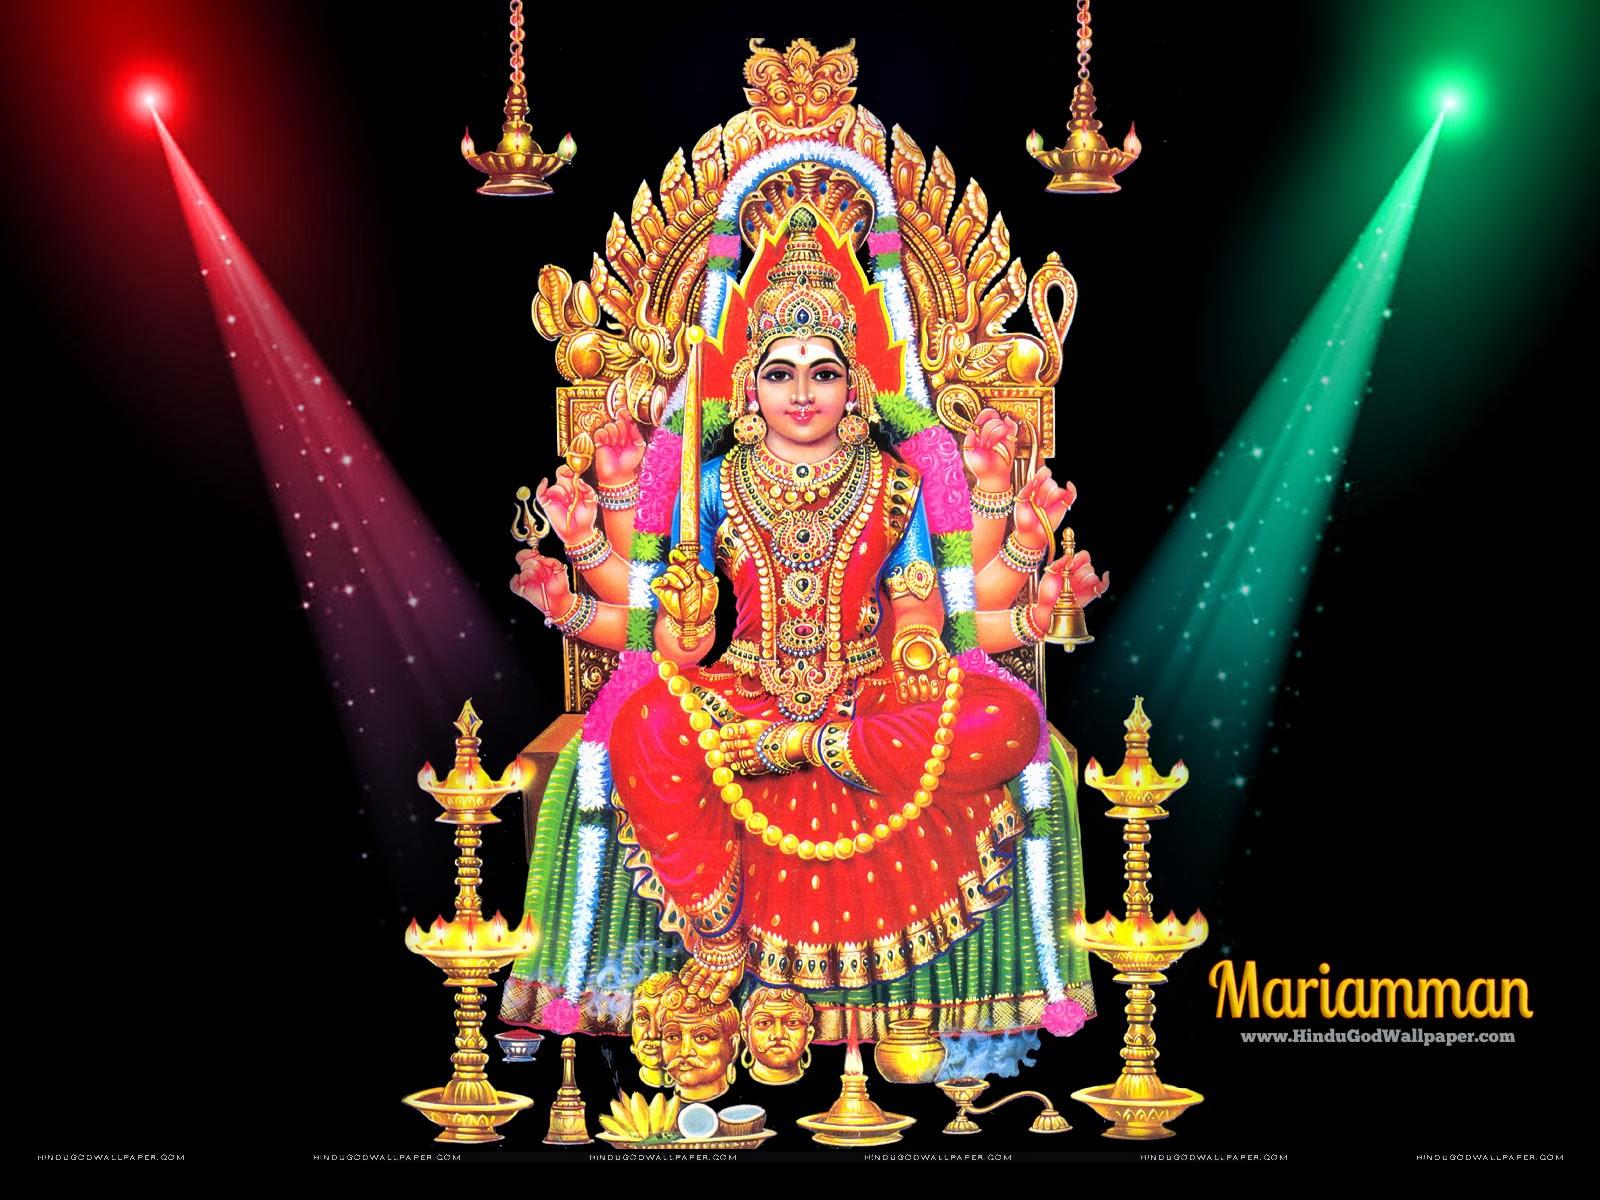 Raja Rani Hd Wallpapers With Quotes Amman Hindu God Wallpapers Download